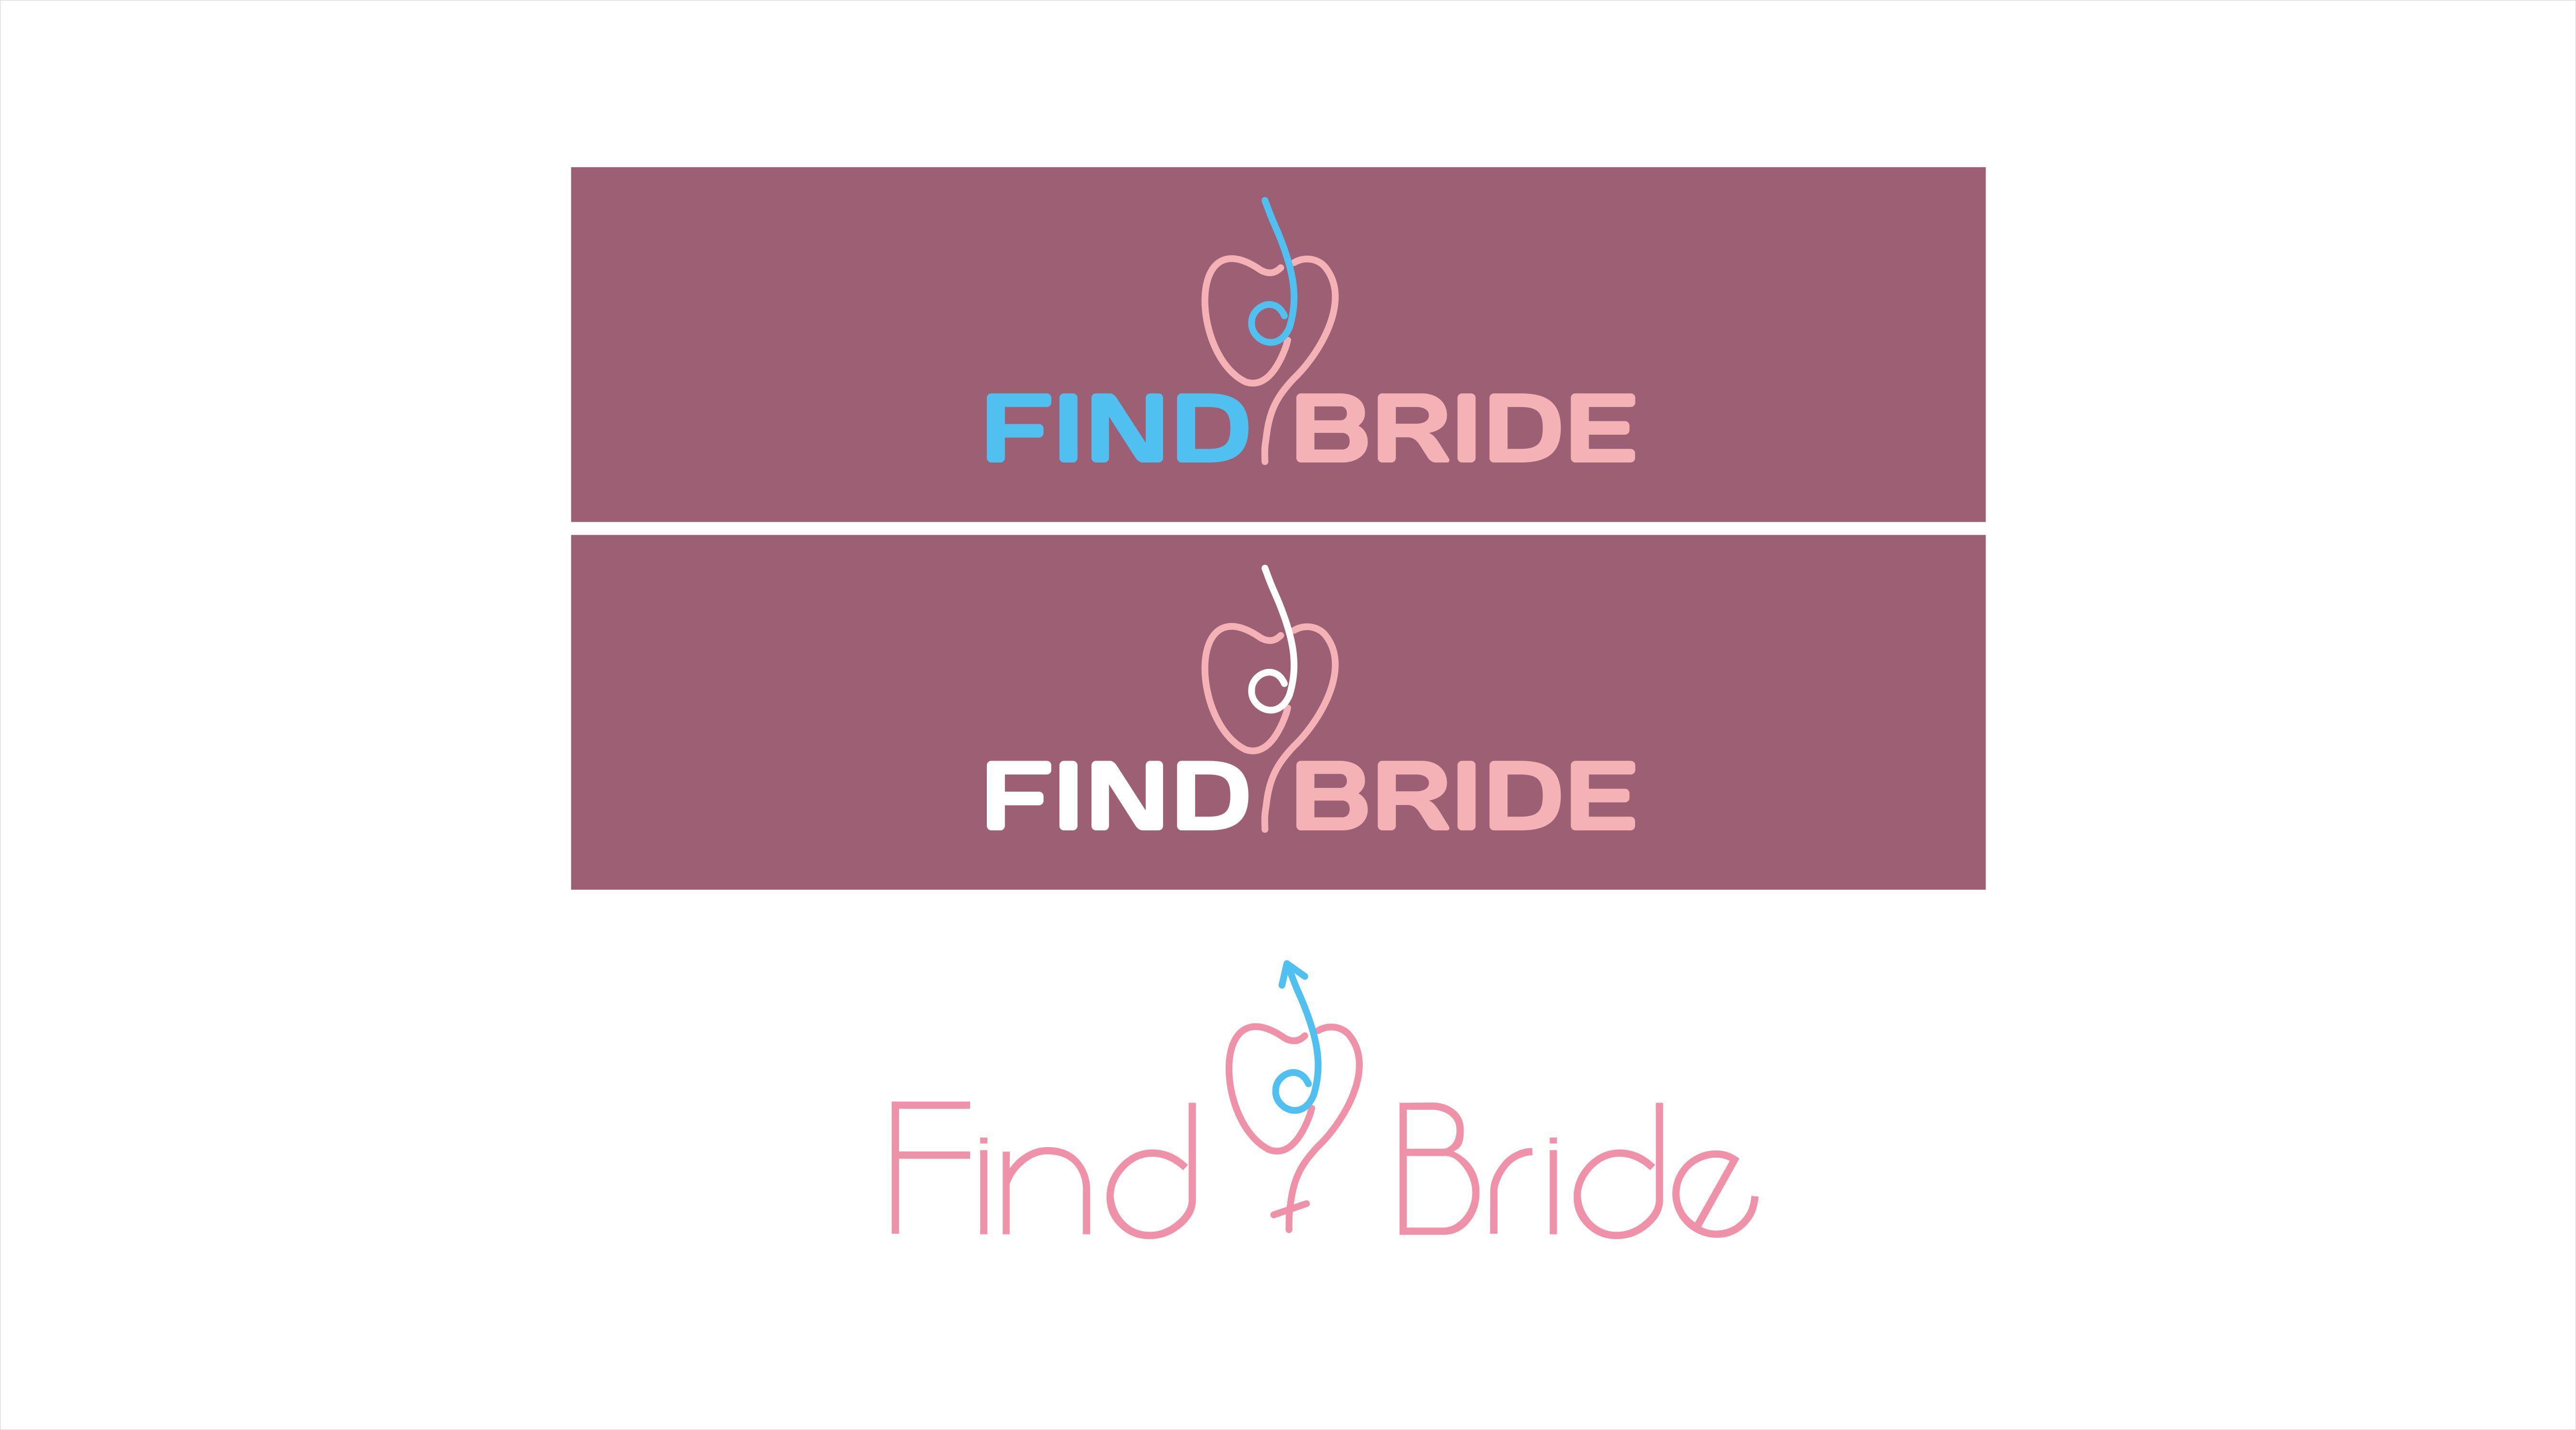 Нарисовать логотип сайта знакомств фото f_1015ace096e26d14.jpg